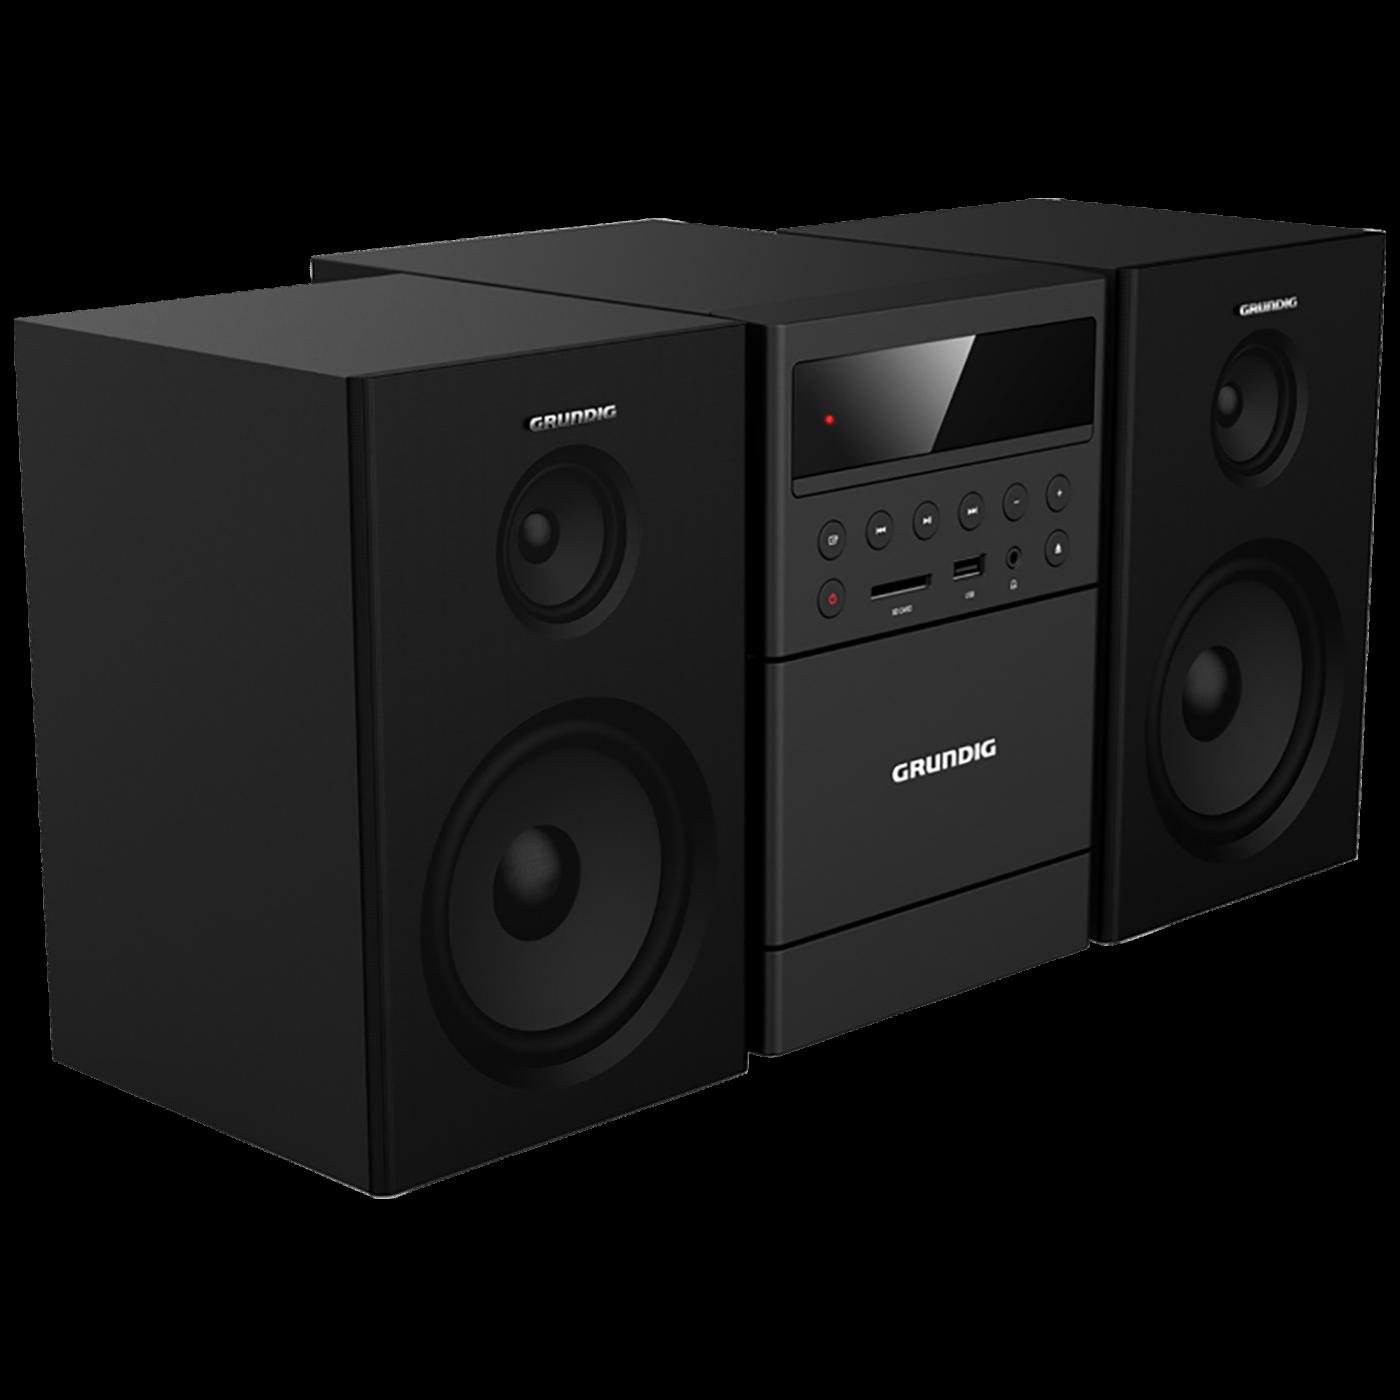 Micro sistem CD, BT, FM radio, MP3/WMA, USB, kasetofon, 20W